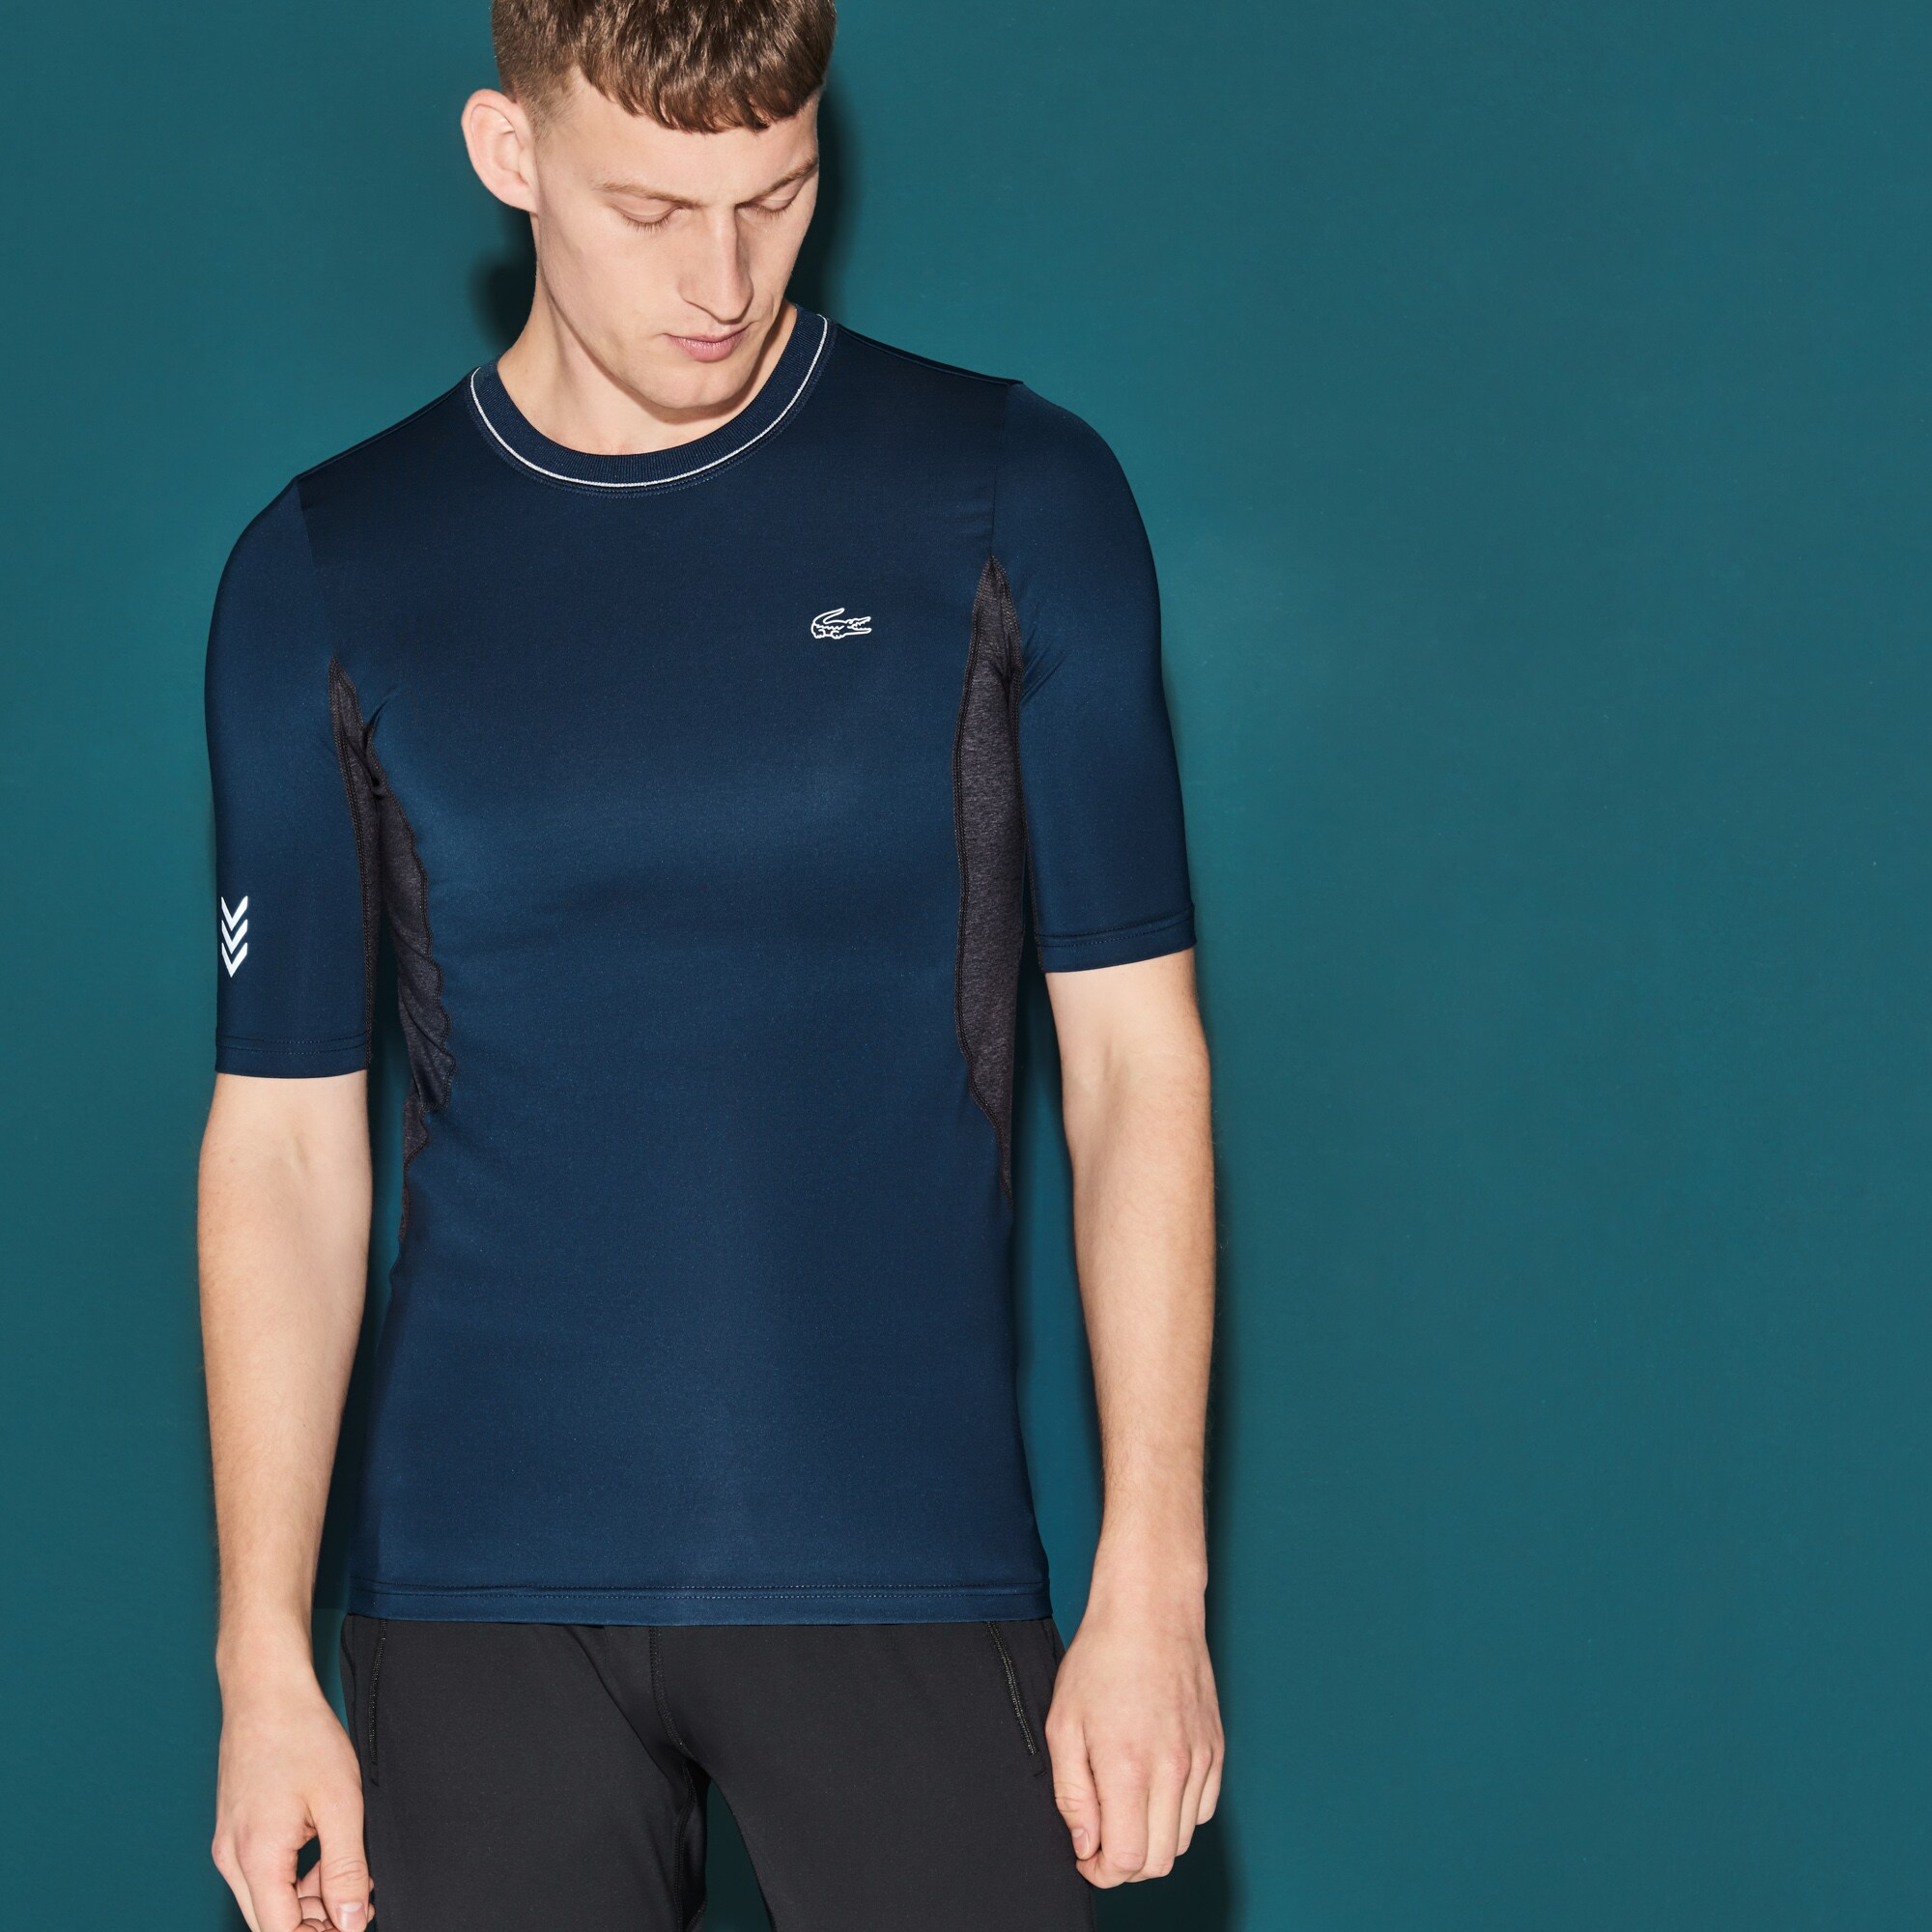 Herren LACOSTE SPORT Kompressions-Tennis T-Shirt